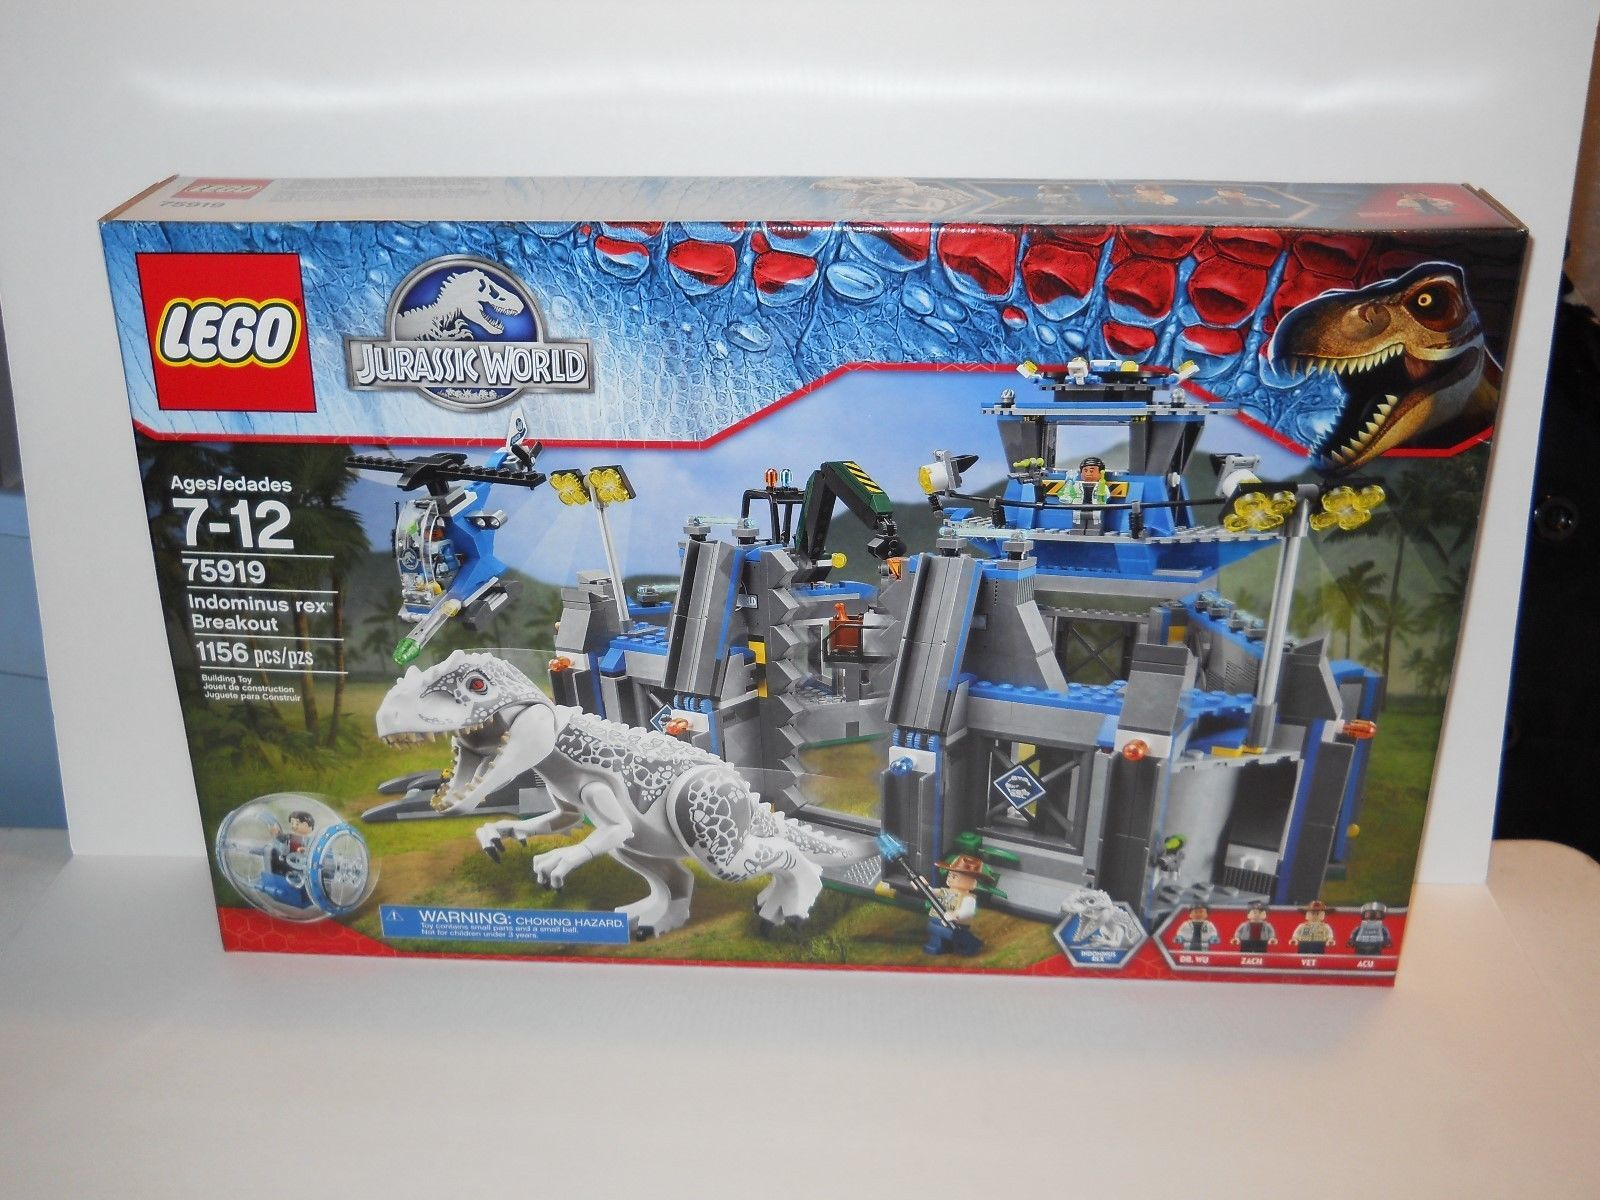 LEGO SET 75919 JURASSIC WORLD INDOMINUS REX BREAKOUT